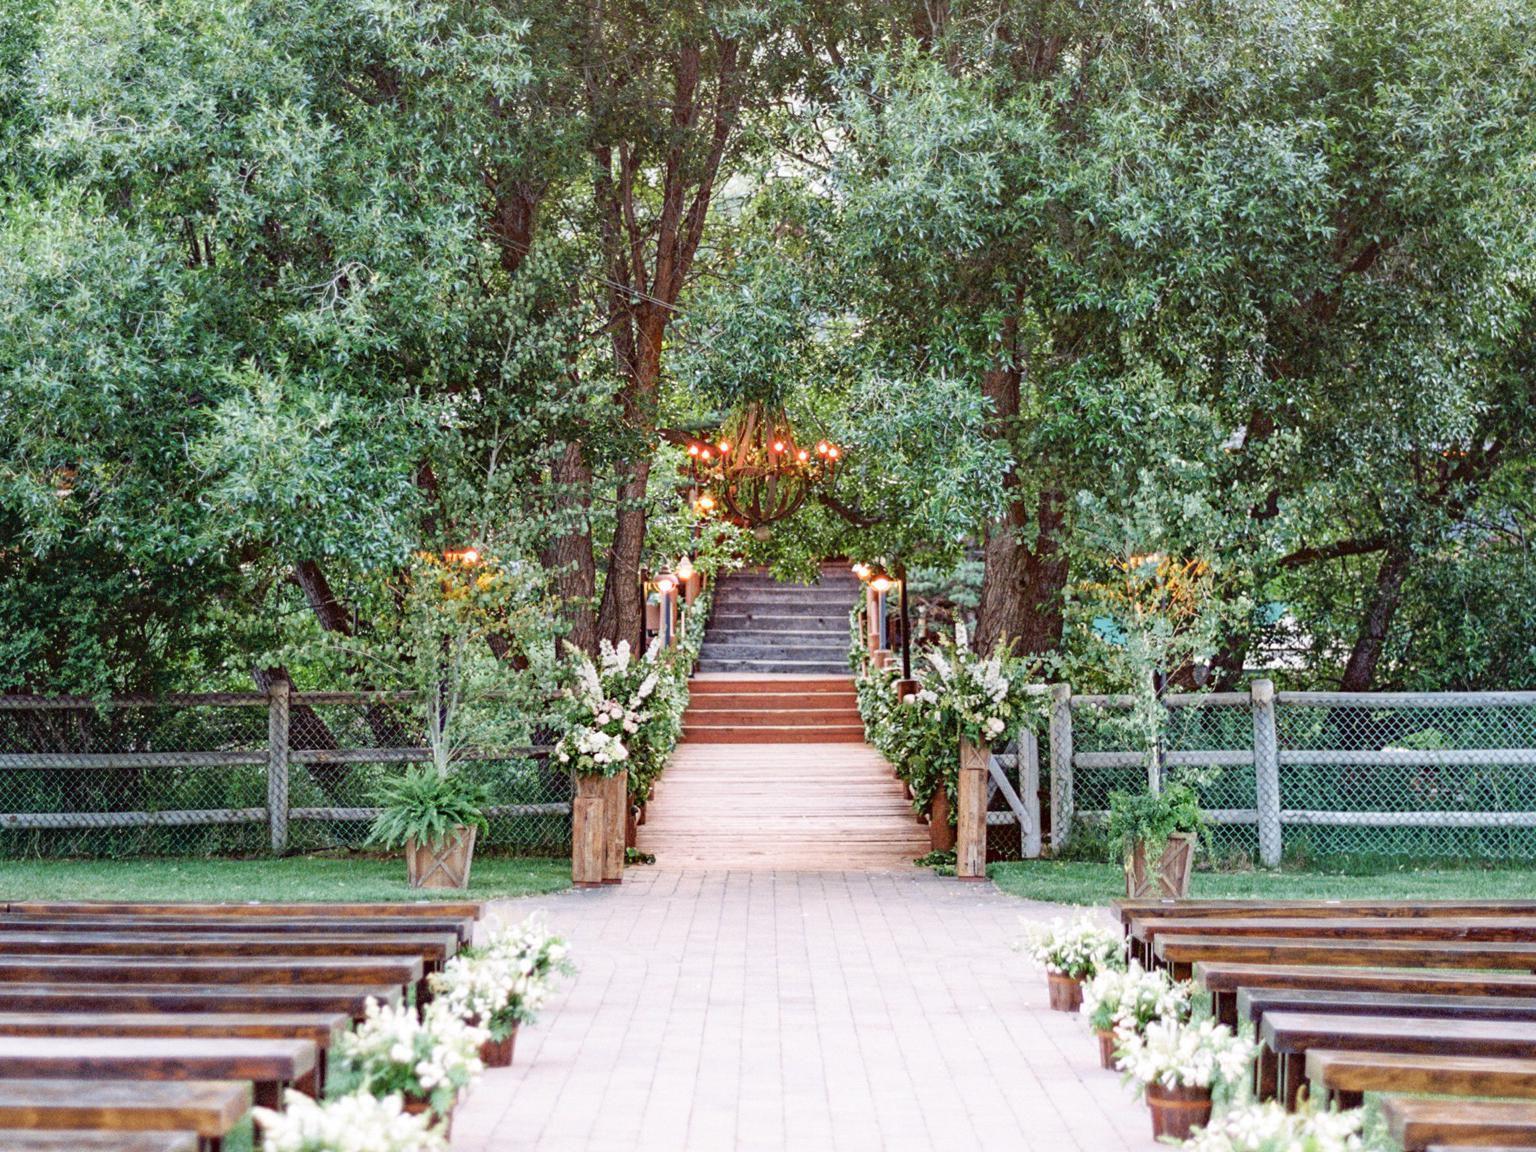 18 Casual Wedding Ideas for a Laid Back Affair